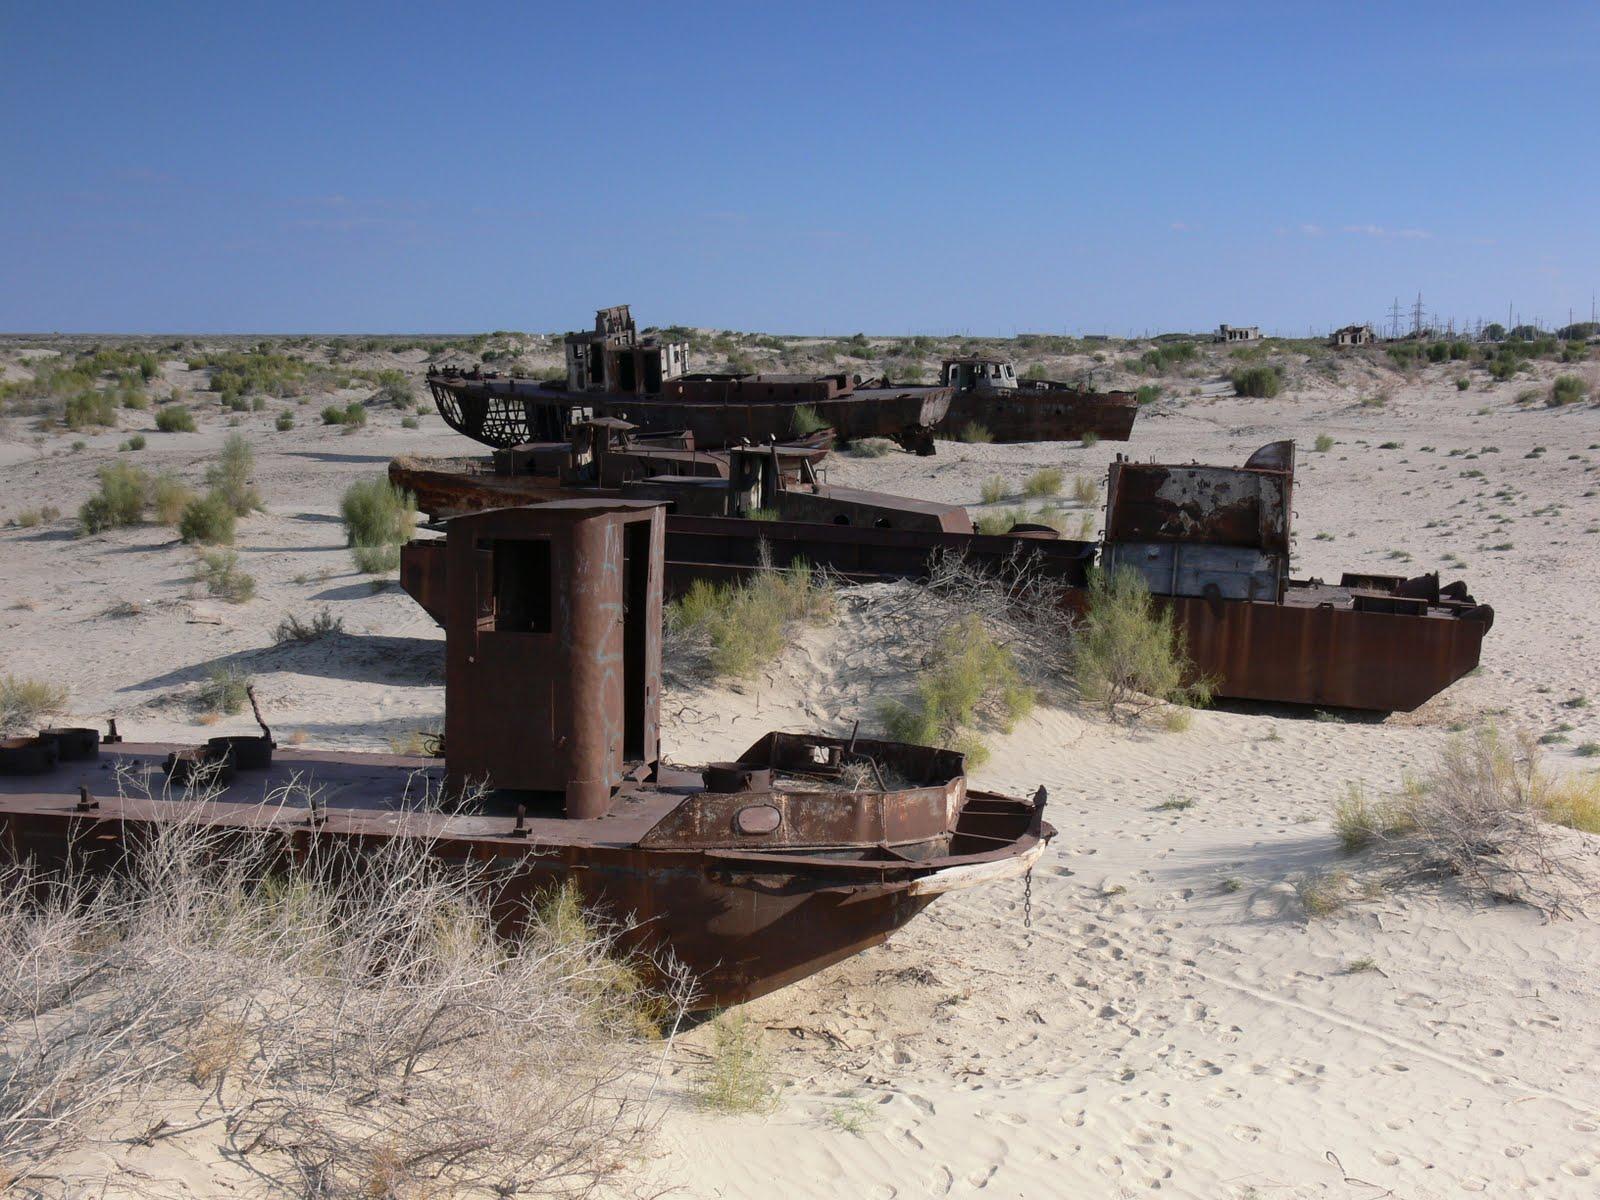 Morze Aralskie, Uzbekistan...